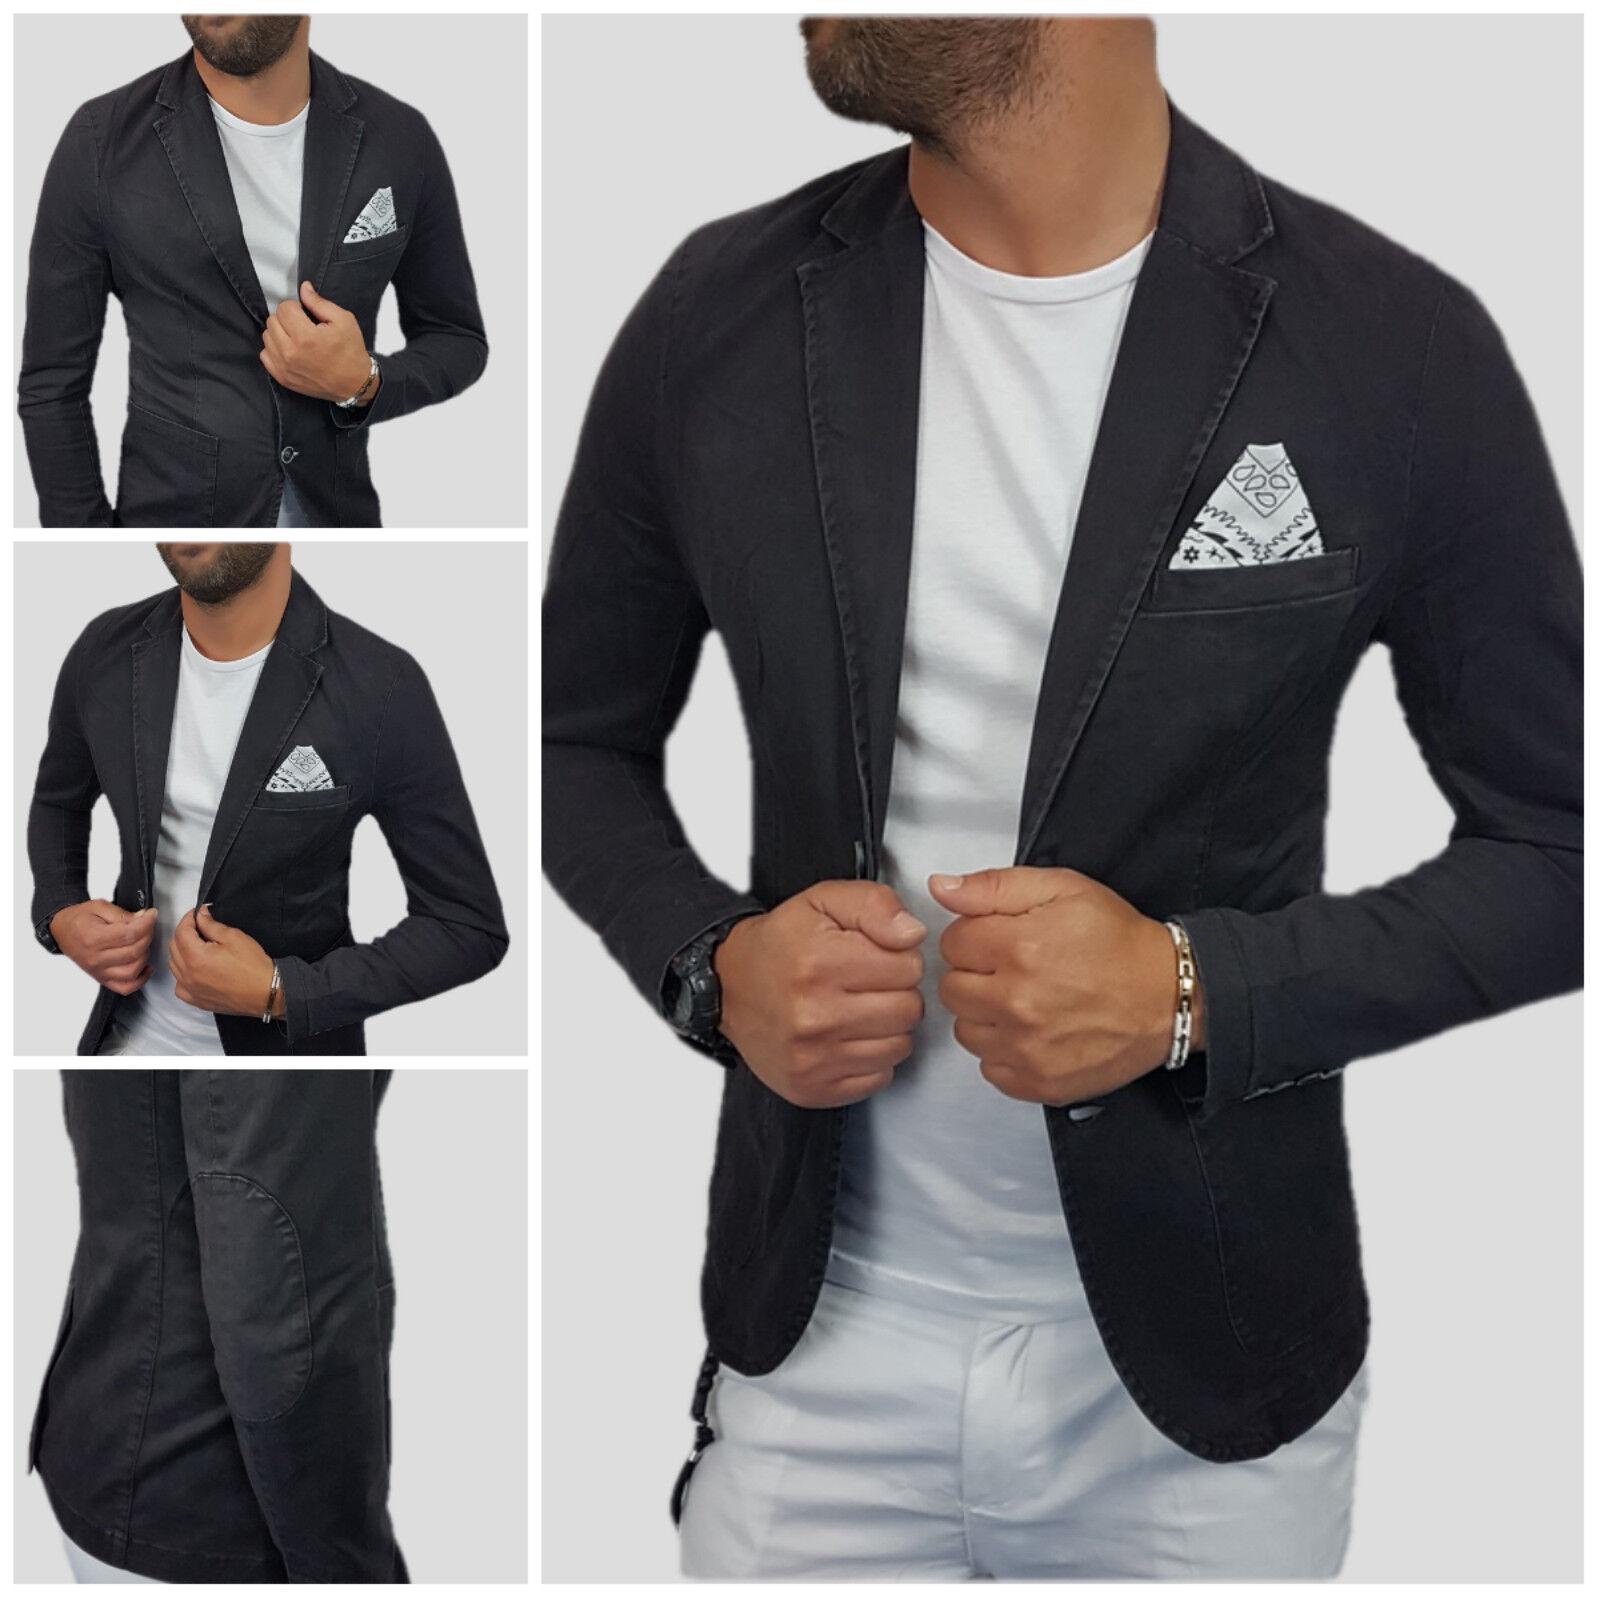 Giacca men Blazer Effetto jeans cotone black Pochette Toppe Slim s,m,l,xl,xxl.